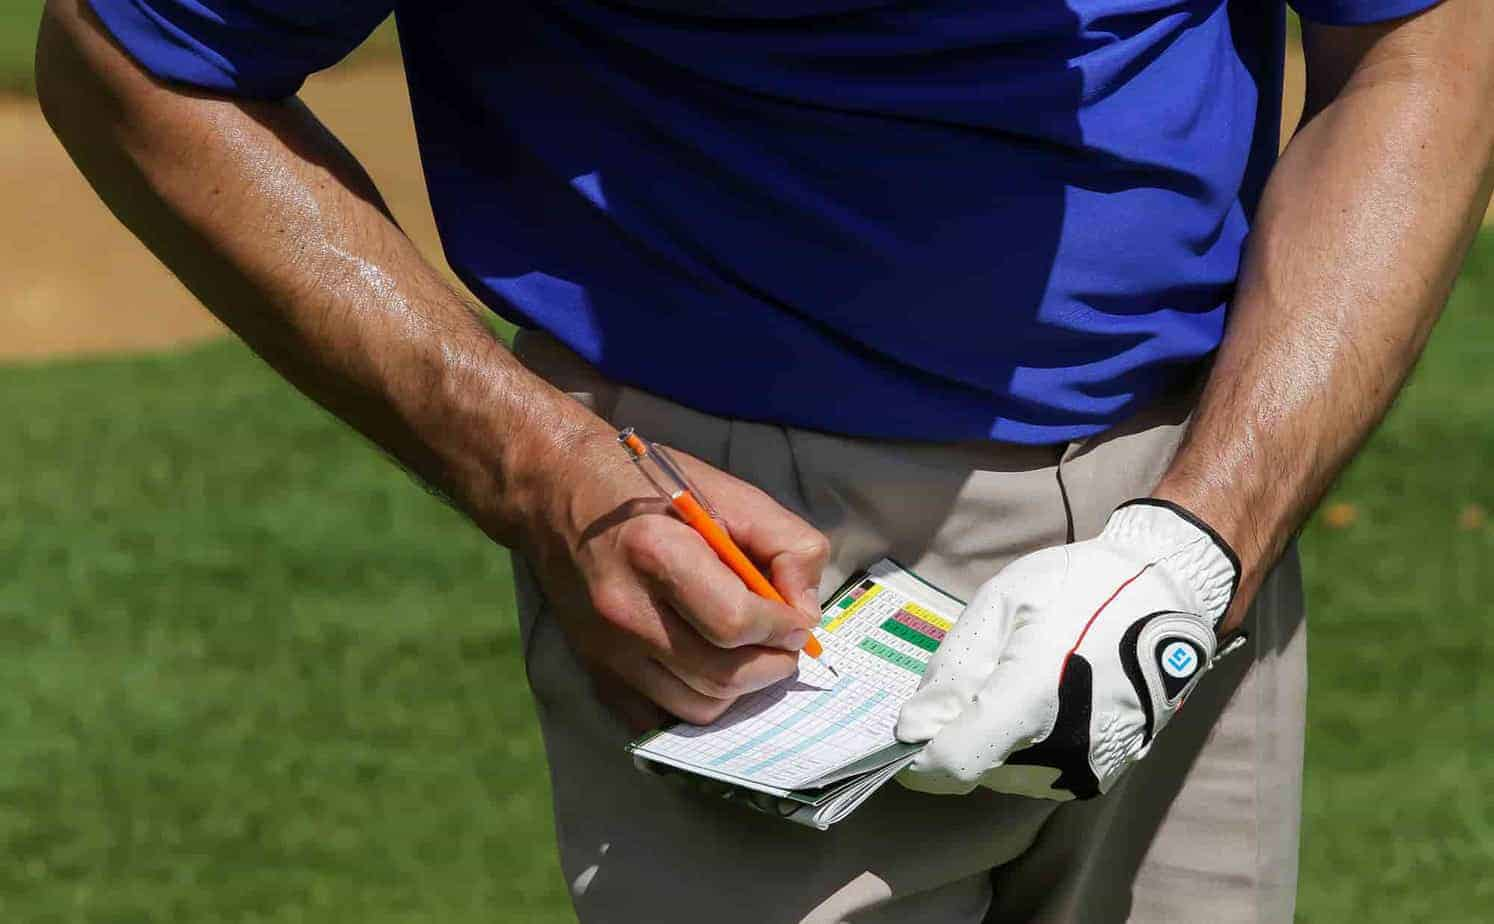 FLOGOLF golfer filling out scorecard